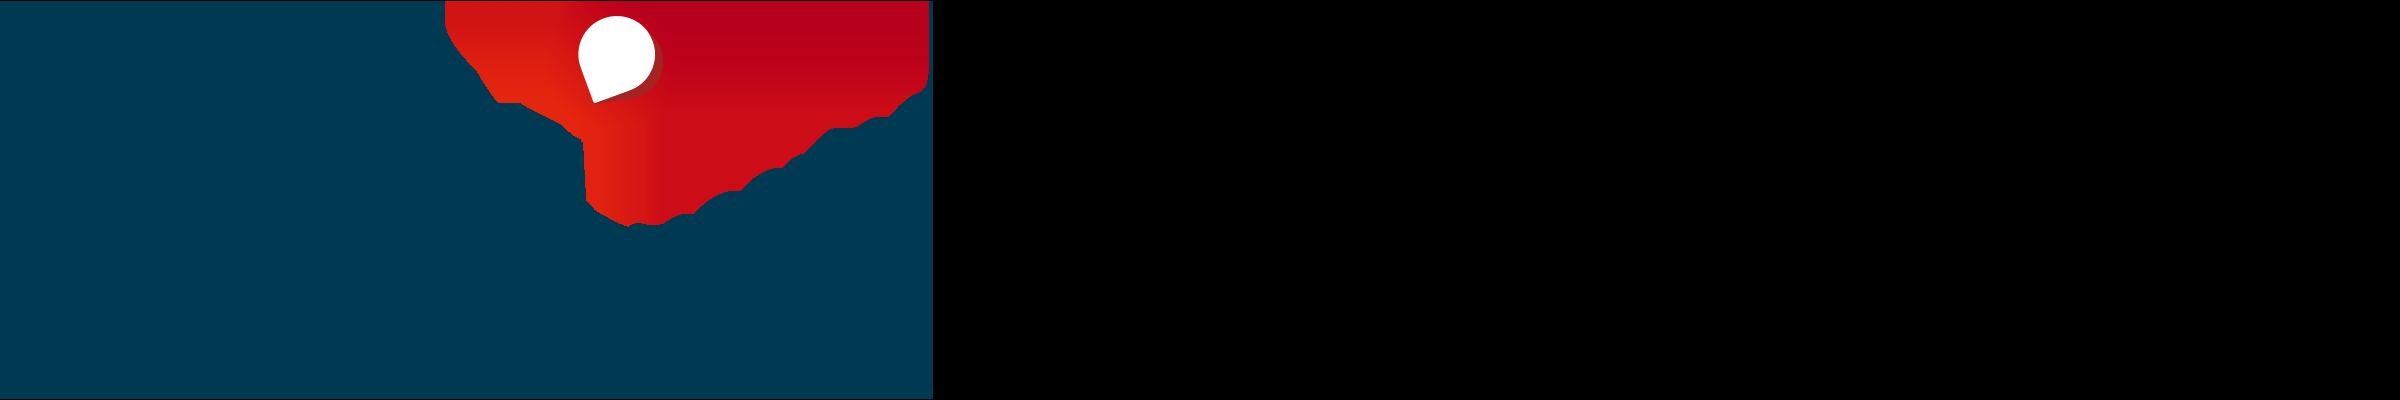 Klink-2400×600